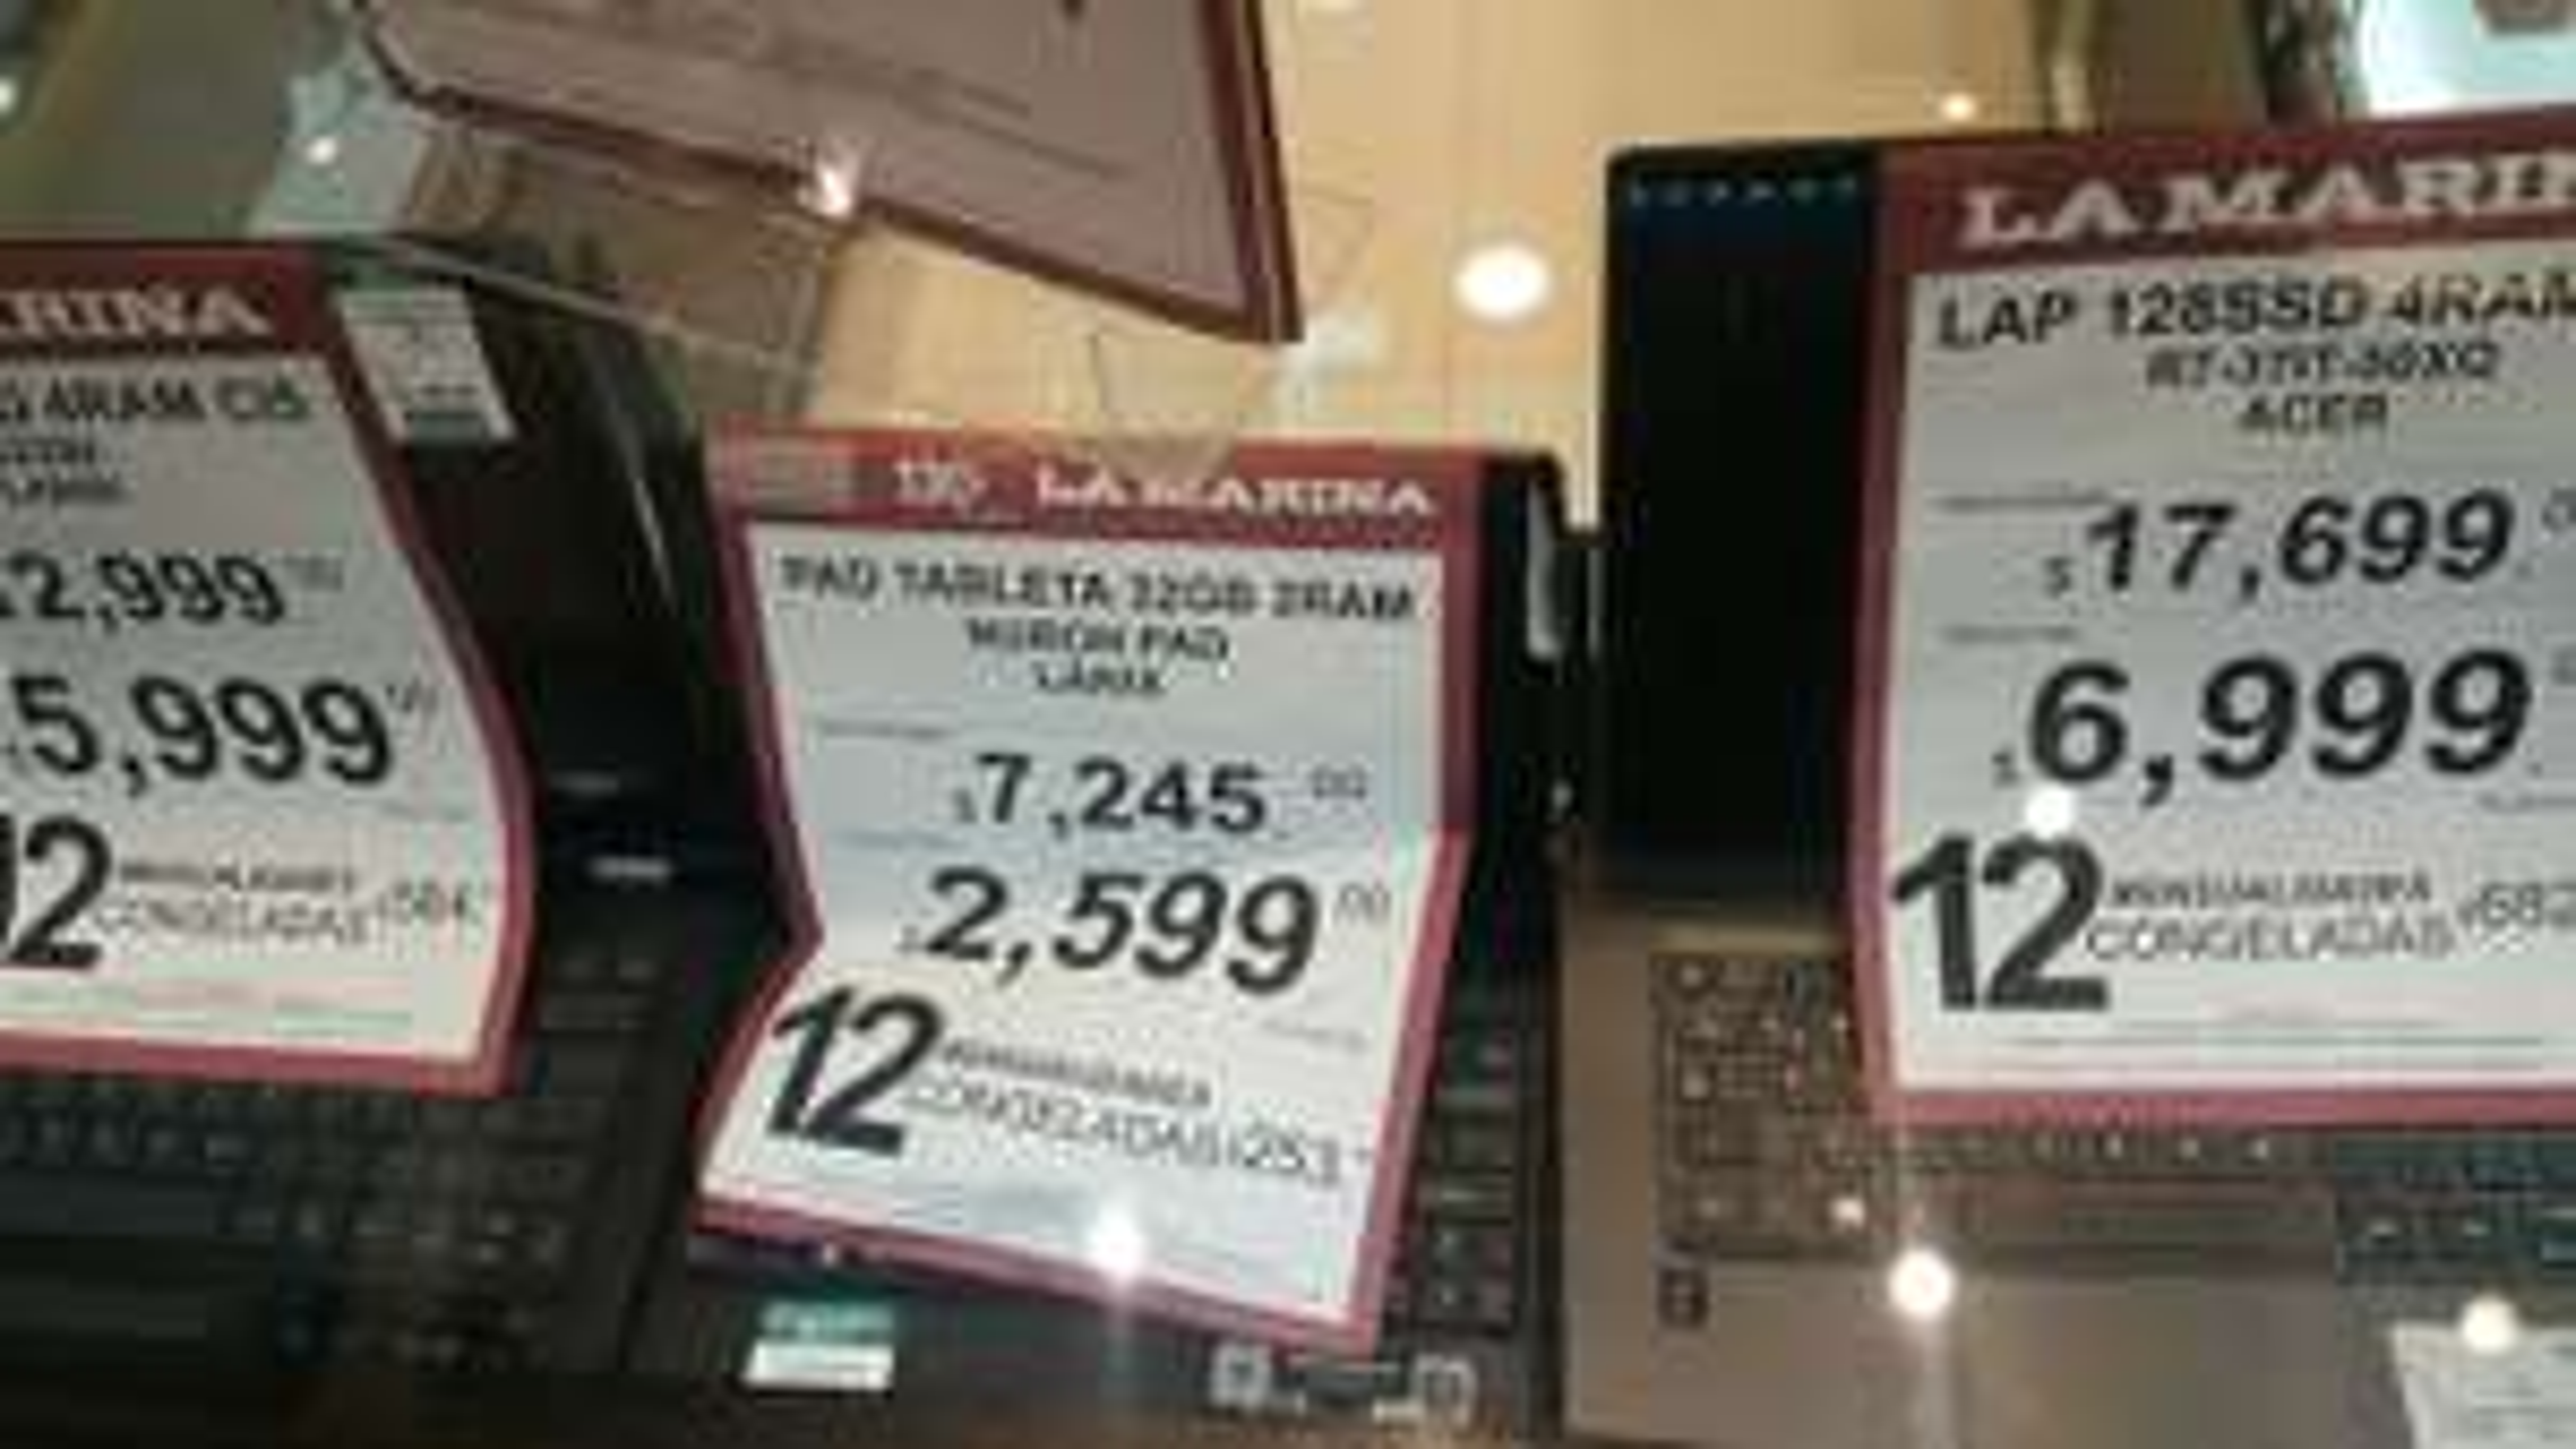 La Marina: Laptop Acer r7